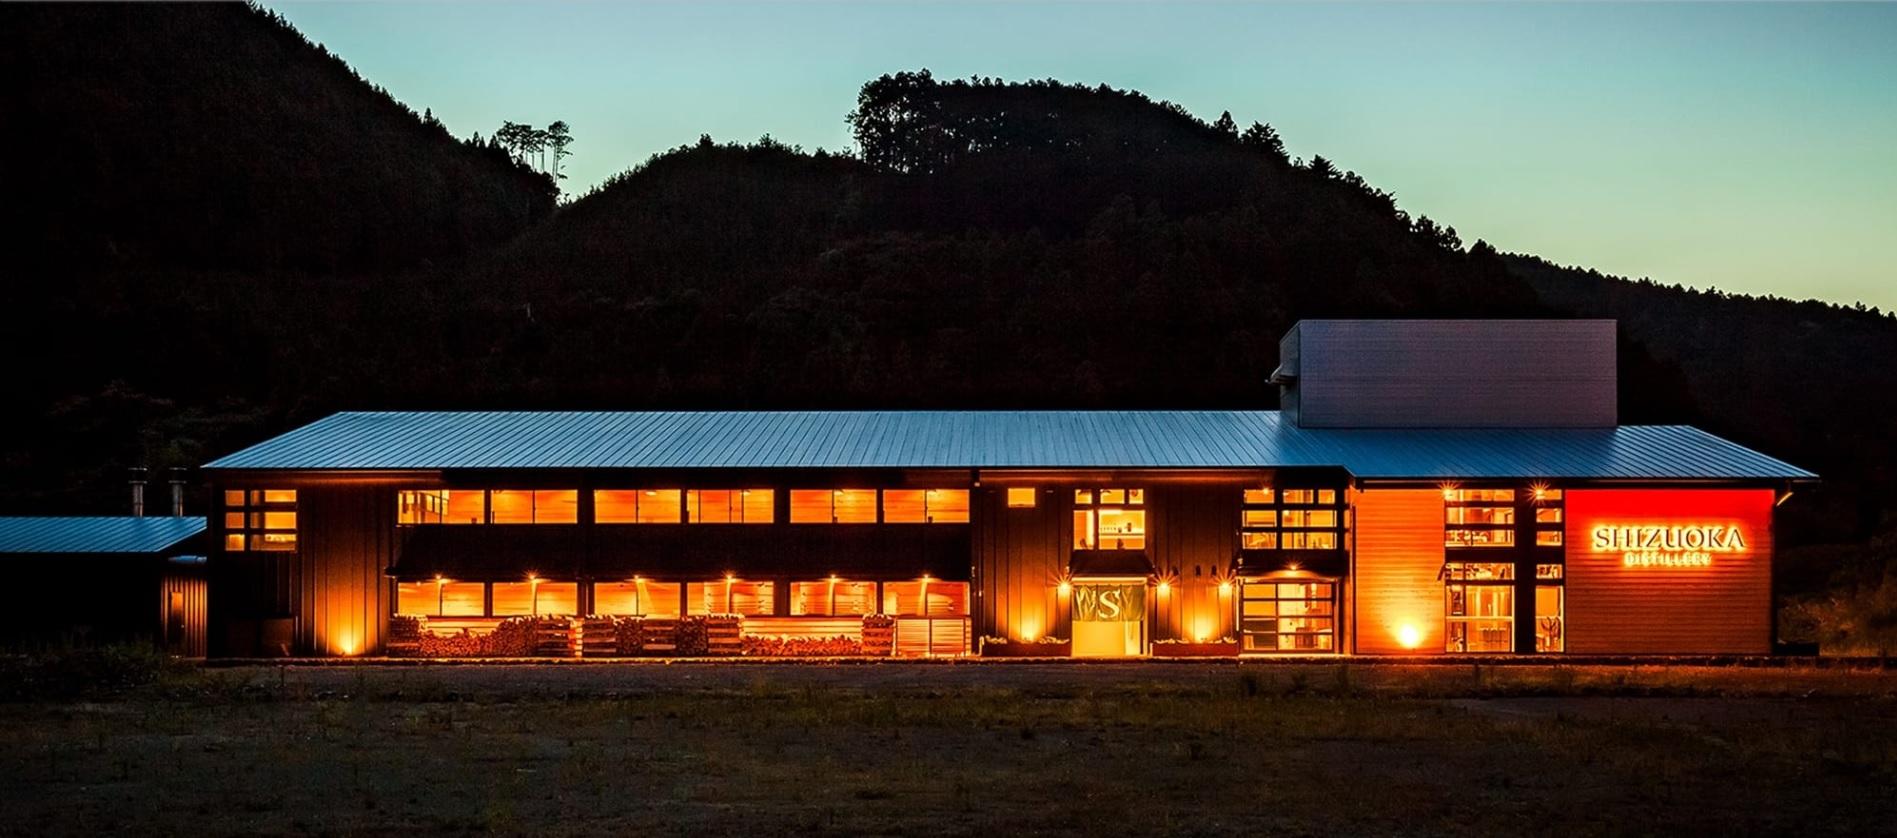 Shizuoka Distillery opening for public tours